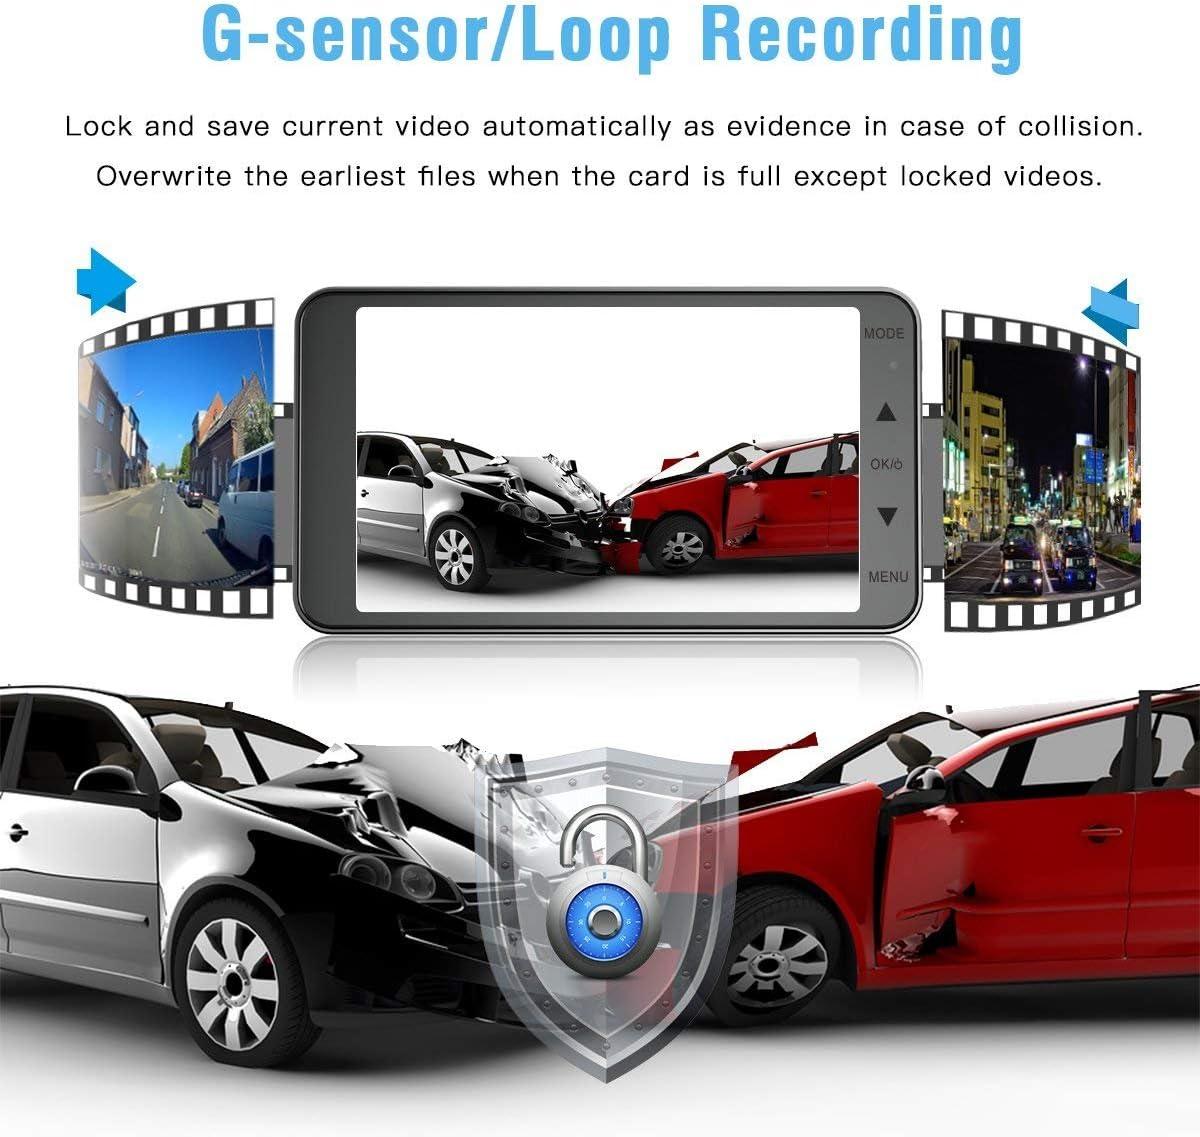 Dash Cam 4 Inch Car Camera-Car Camcorder Super HD 1080P LCD Display Recorder with Front+VGA Rear 290/°Super Wide Angle Built-in G-Sensor Night Vision Recording Loop Recording and Parking Monitorin